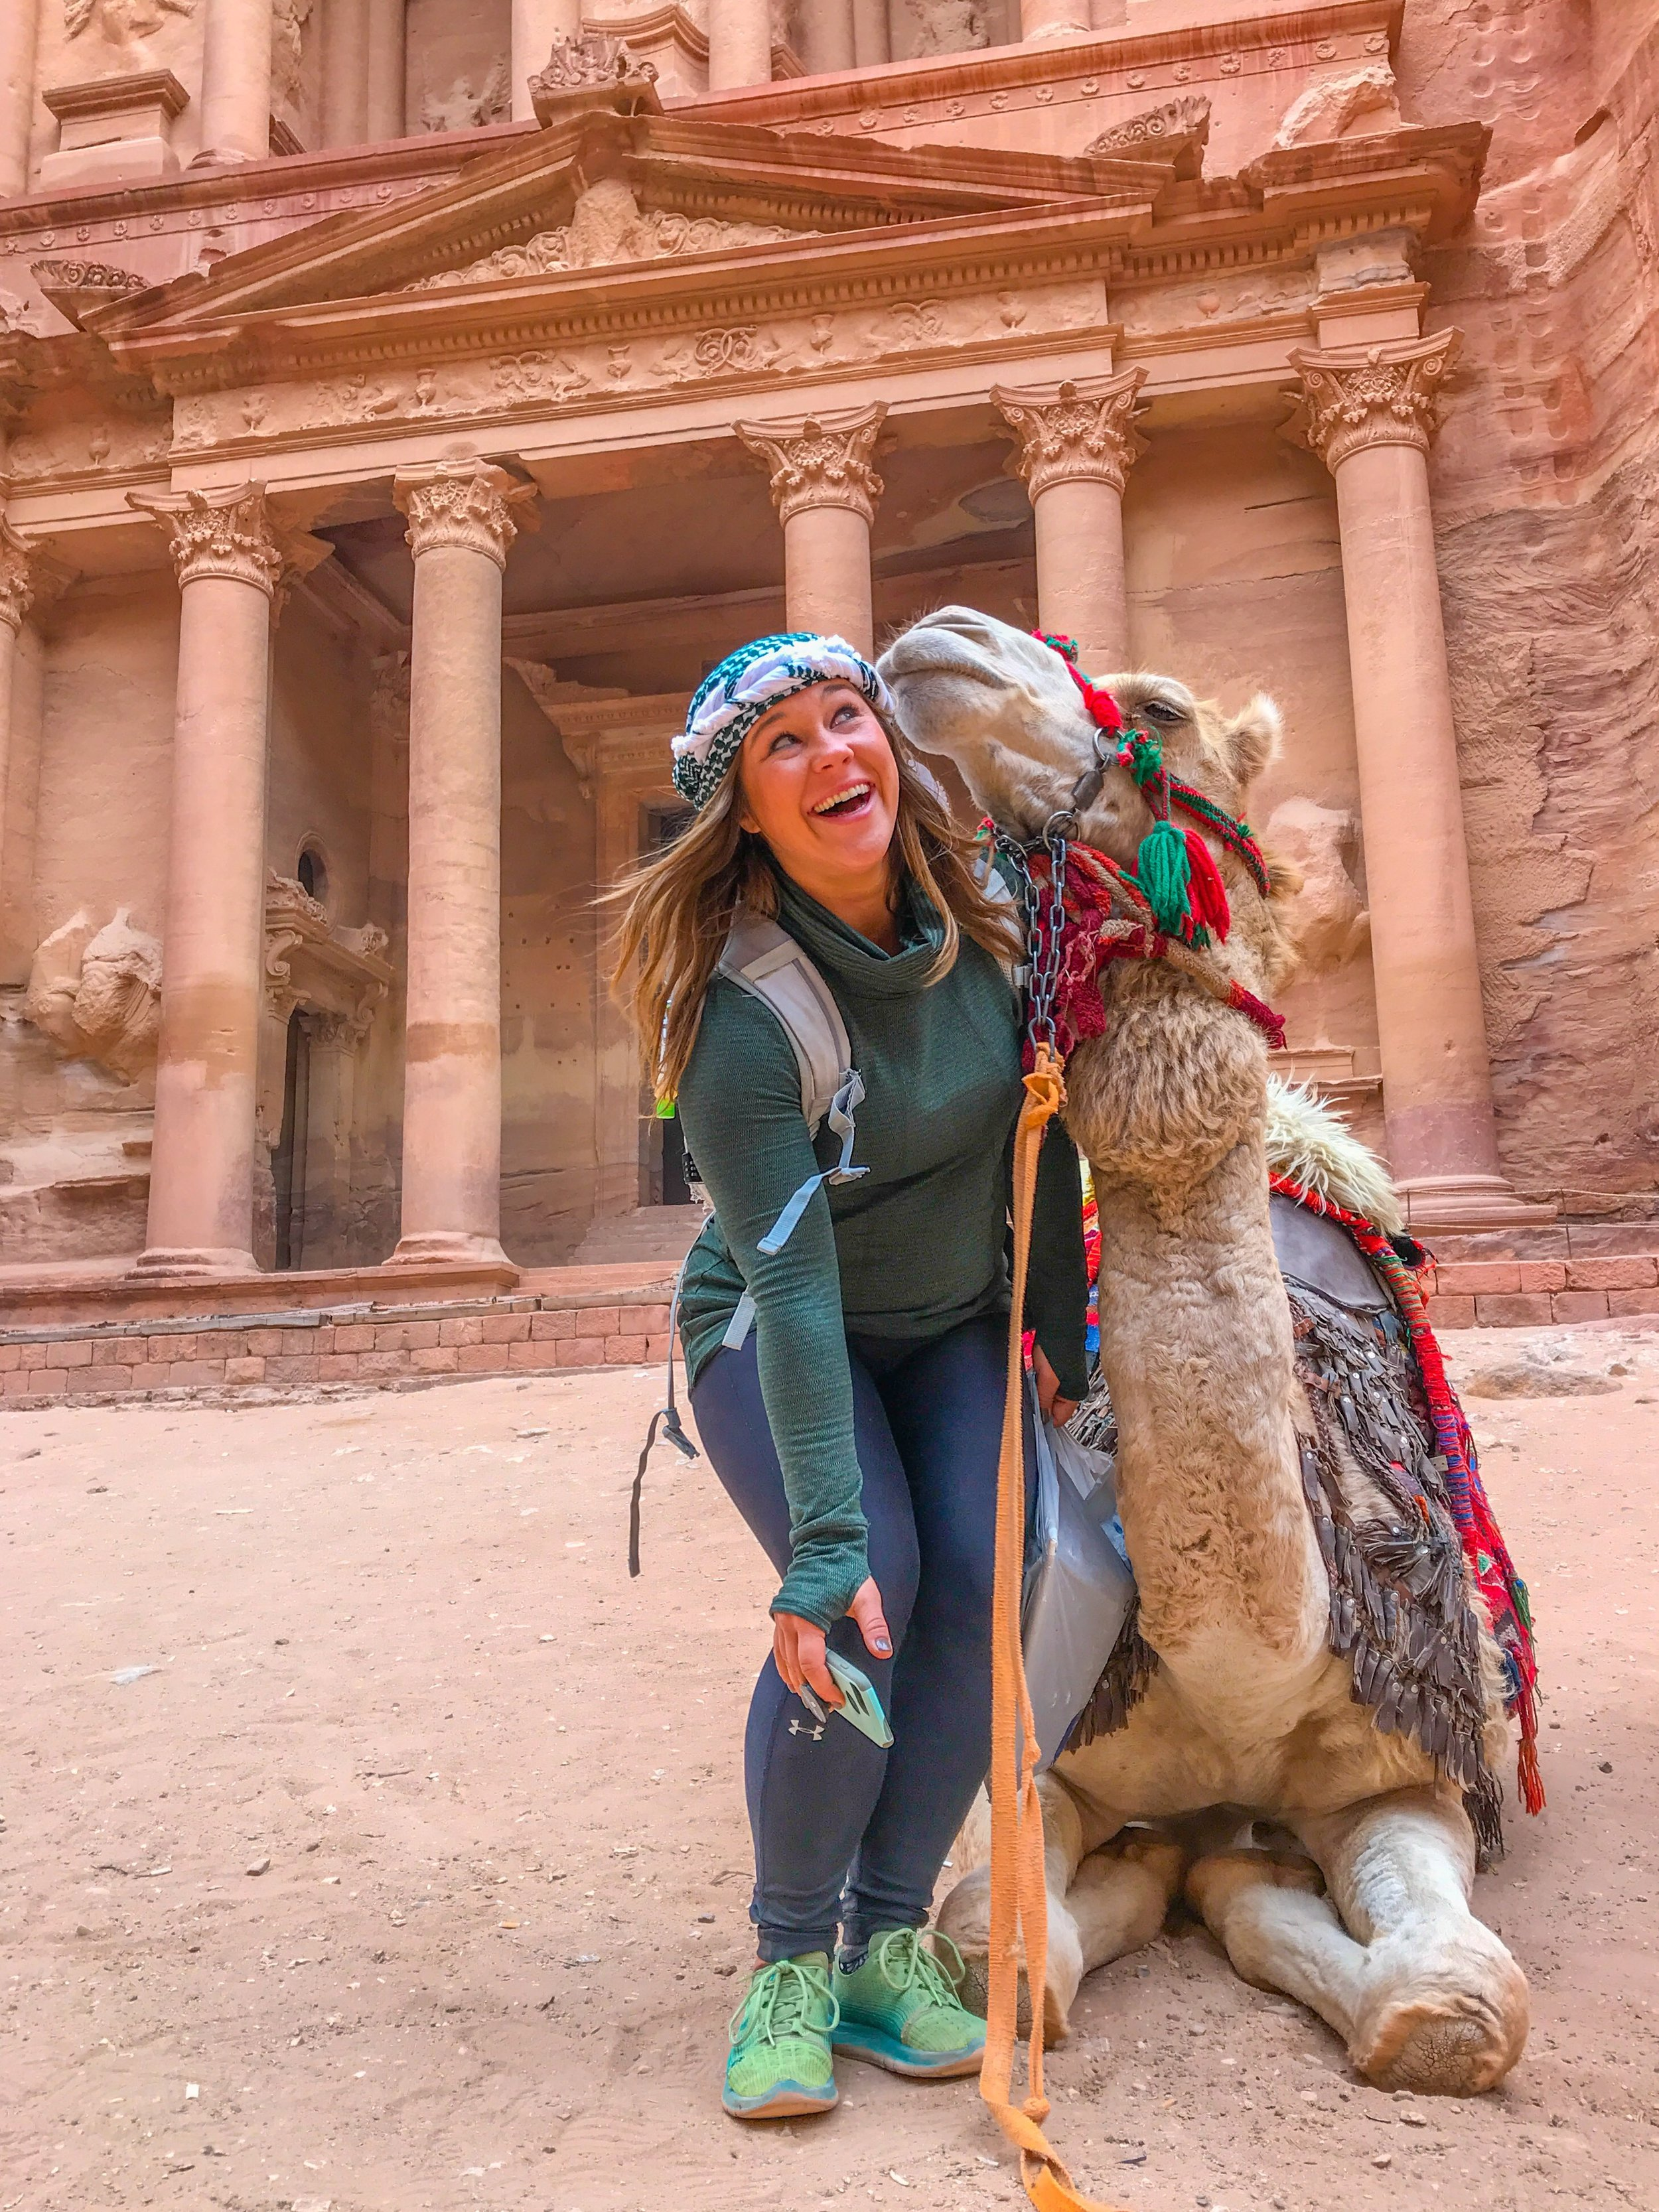 Solo female travel in Jordan is safe